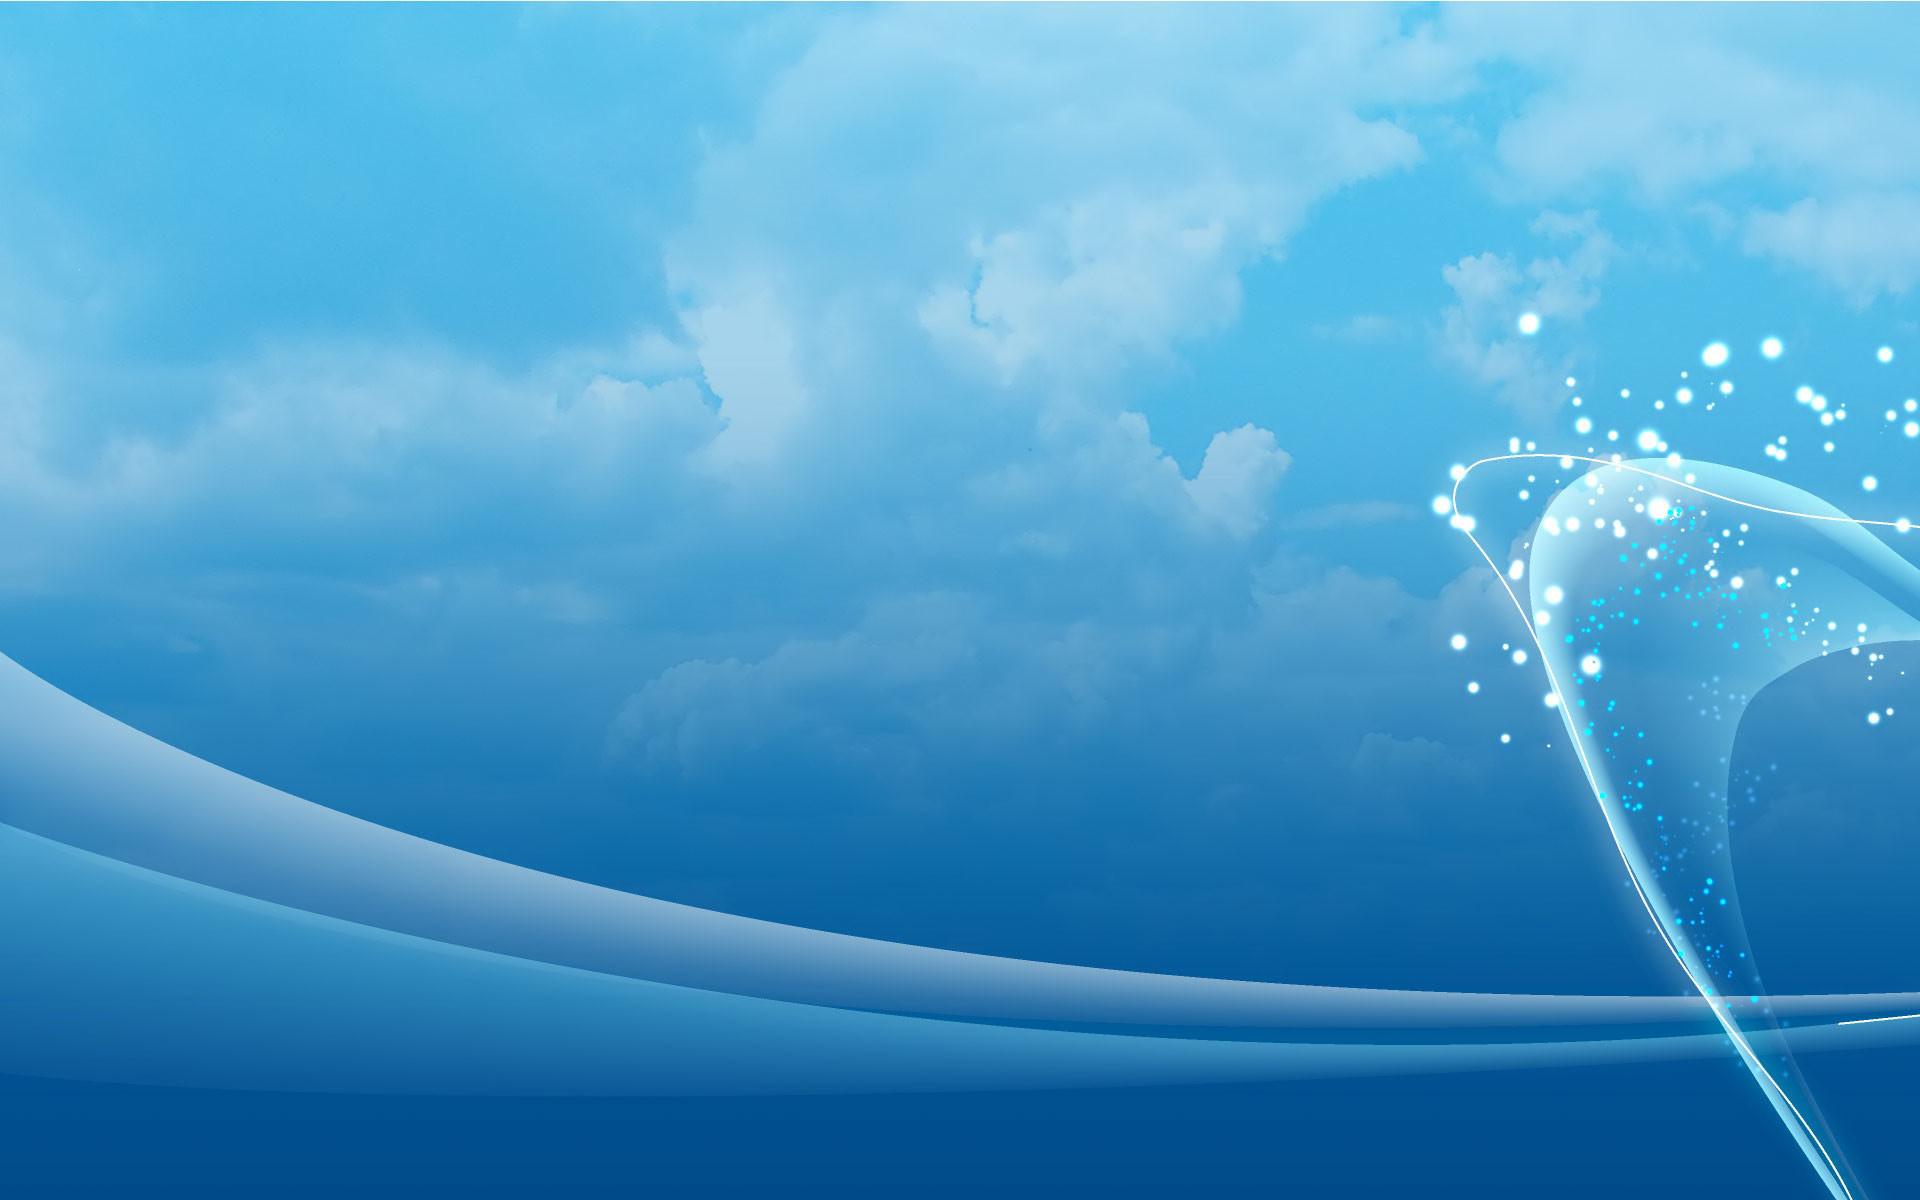 Light Blue Backgrounds 1